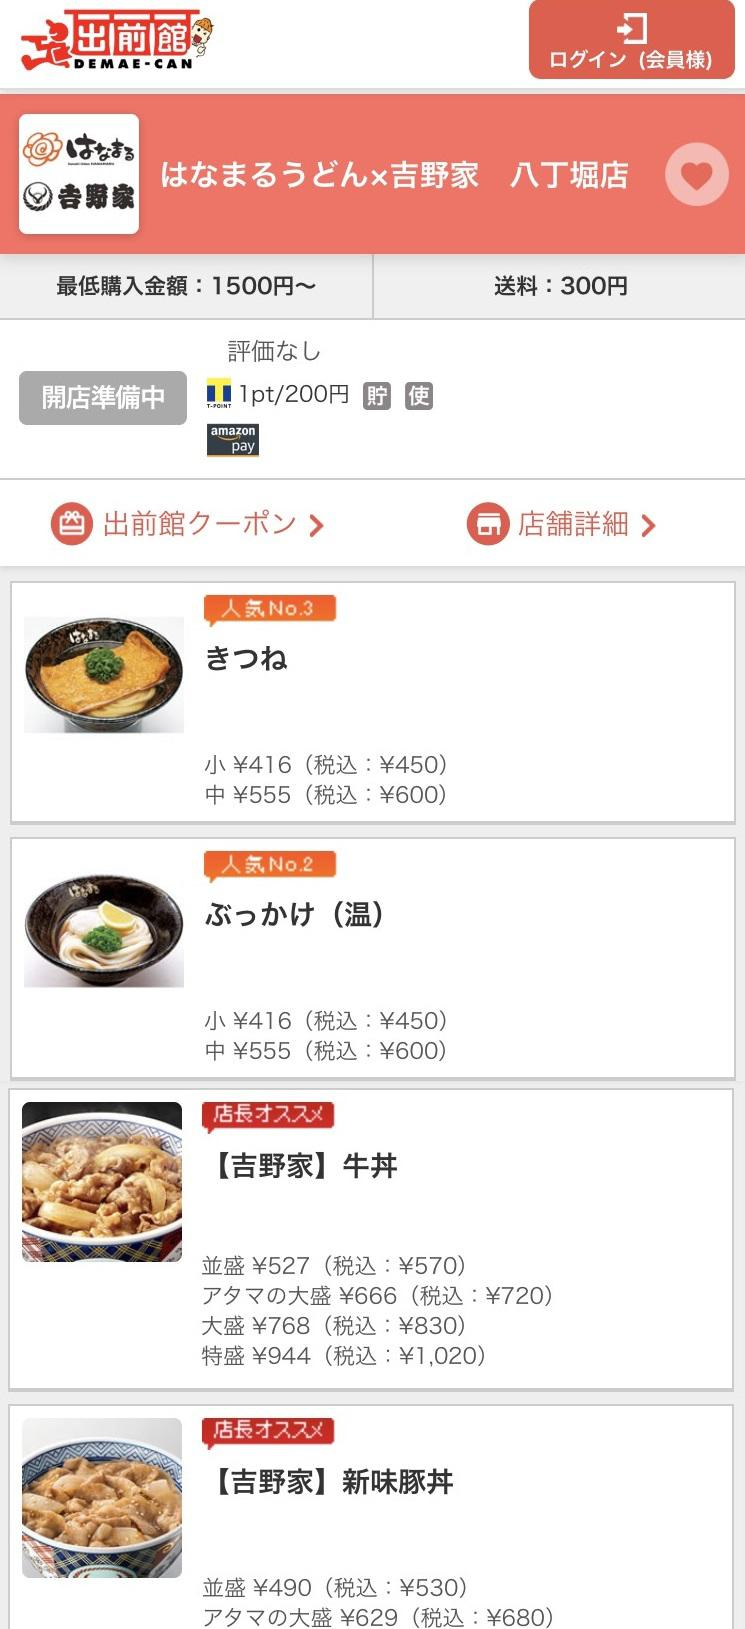 https://www.yumenomachi.co.jp/files/84719edea5b4d18d7841ca16d5e0f0b8a0428bab.jpg